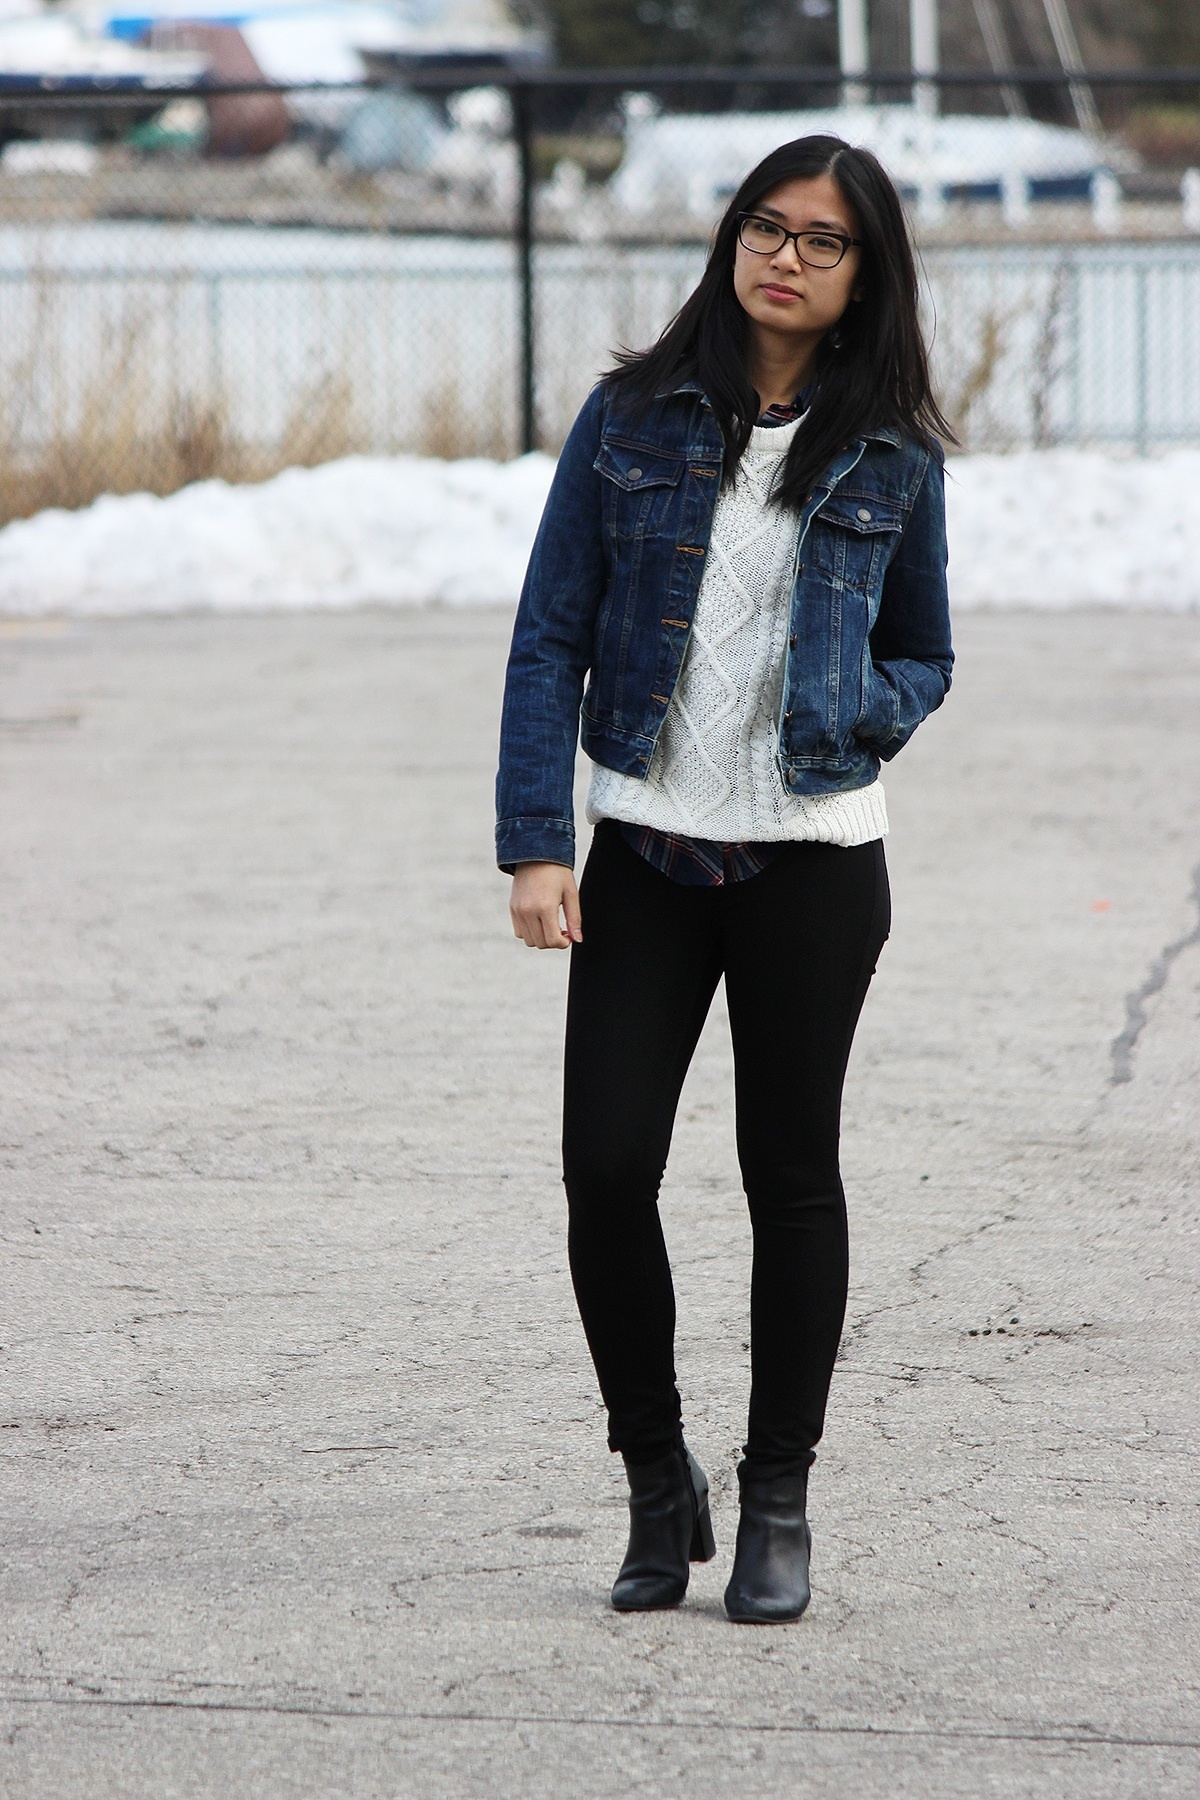 Black dress jean shirt - Black Skinny Jeans With Denim Shirt